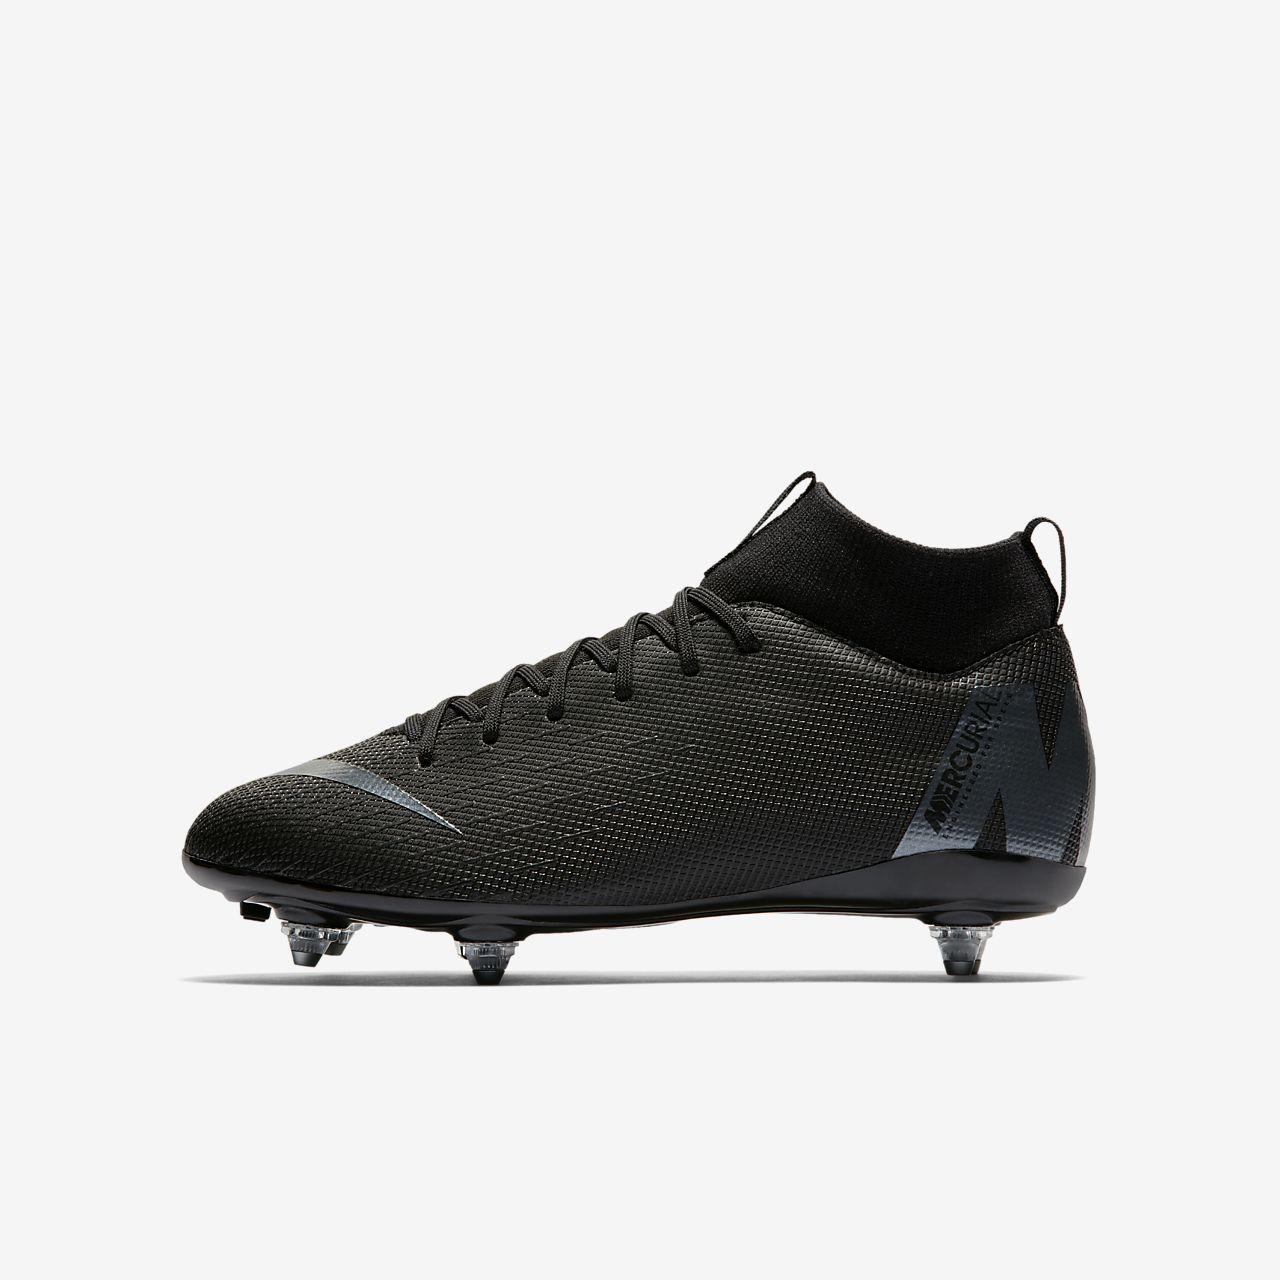 Jr Terrain Gras De Football À Chaussure Nike Crampons Pour HXqa8w